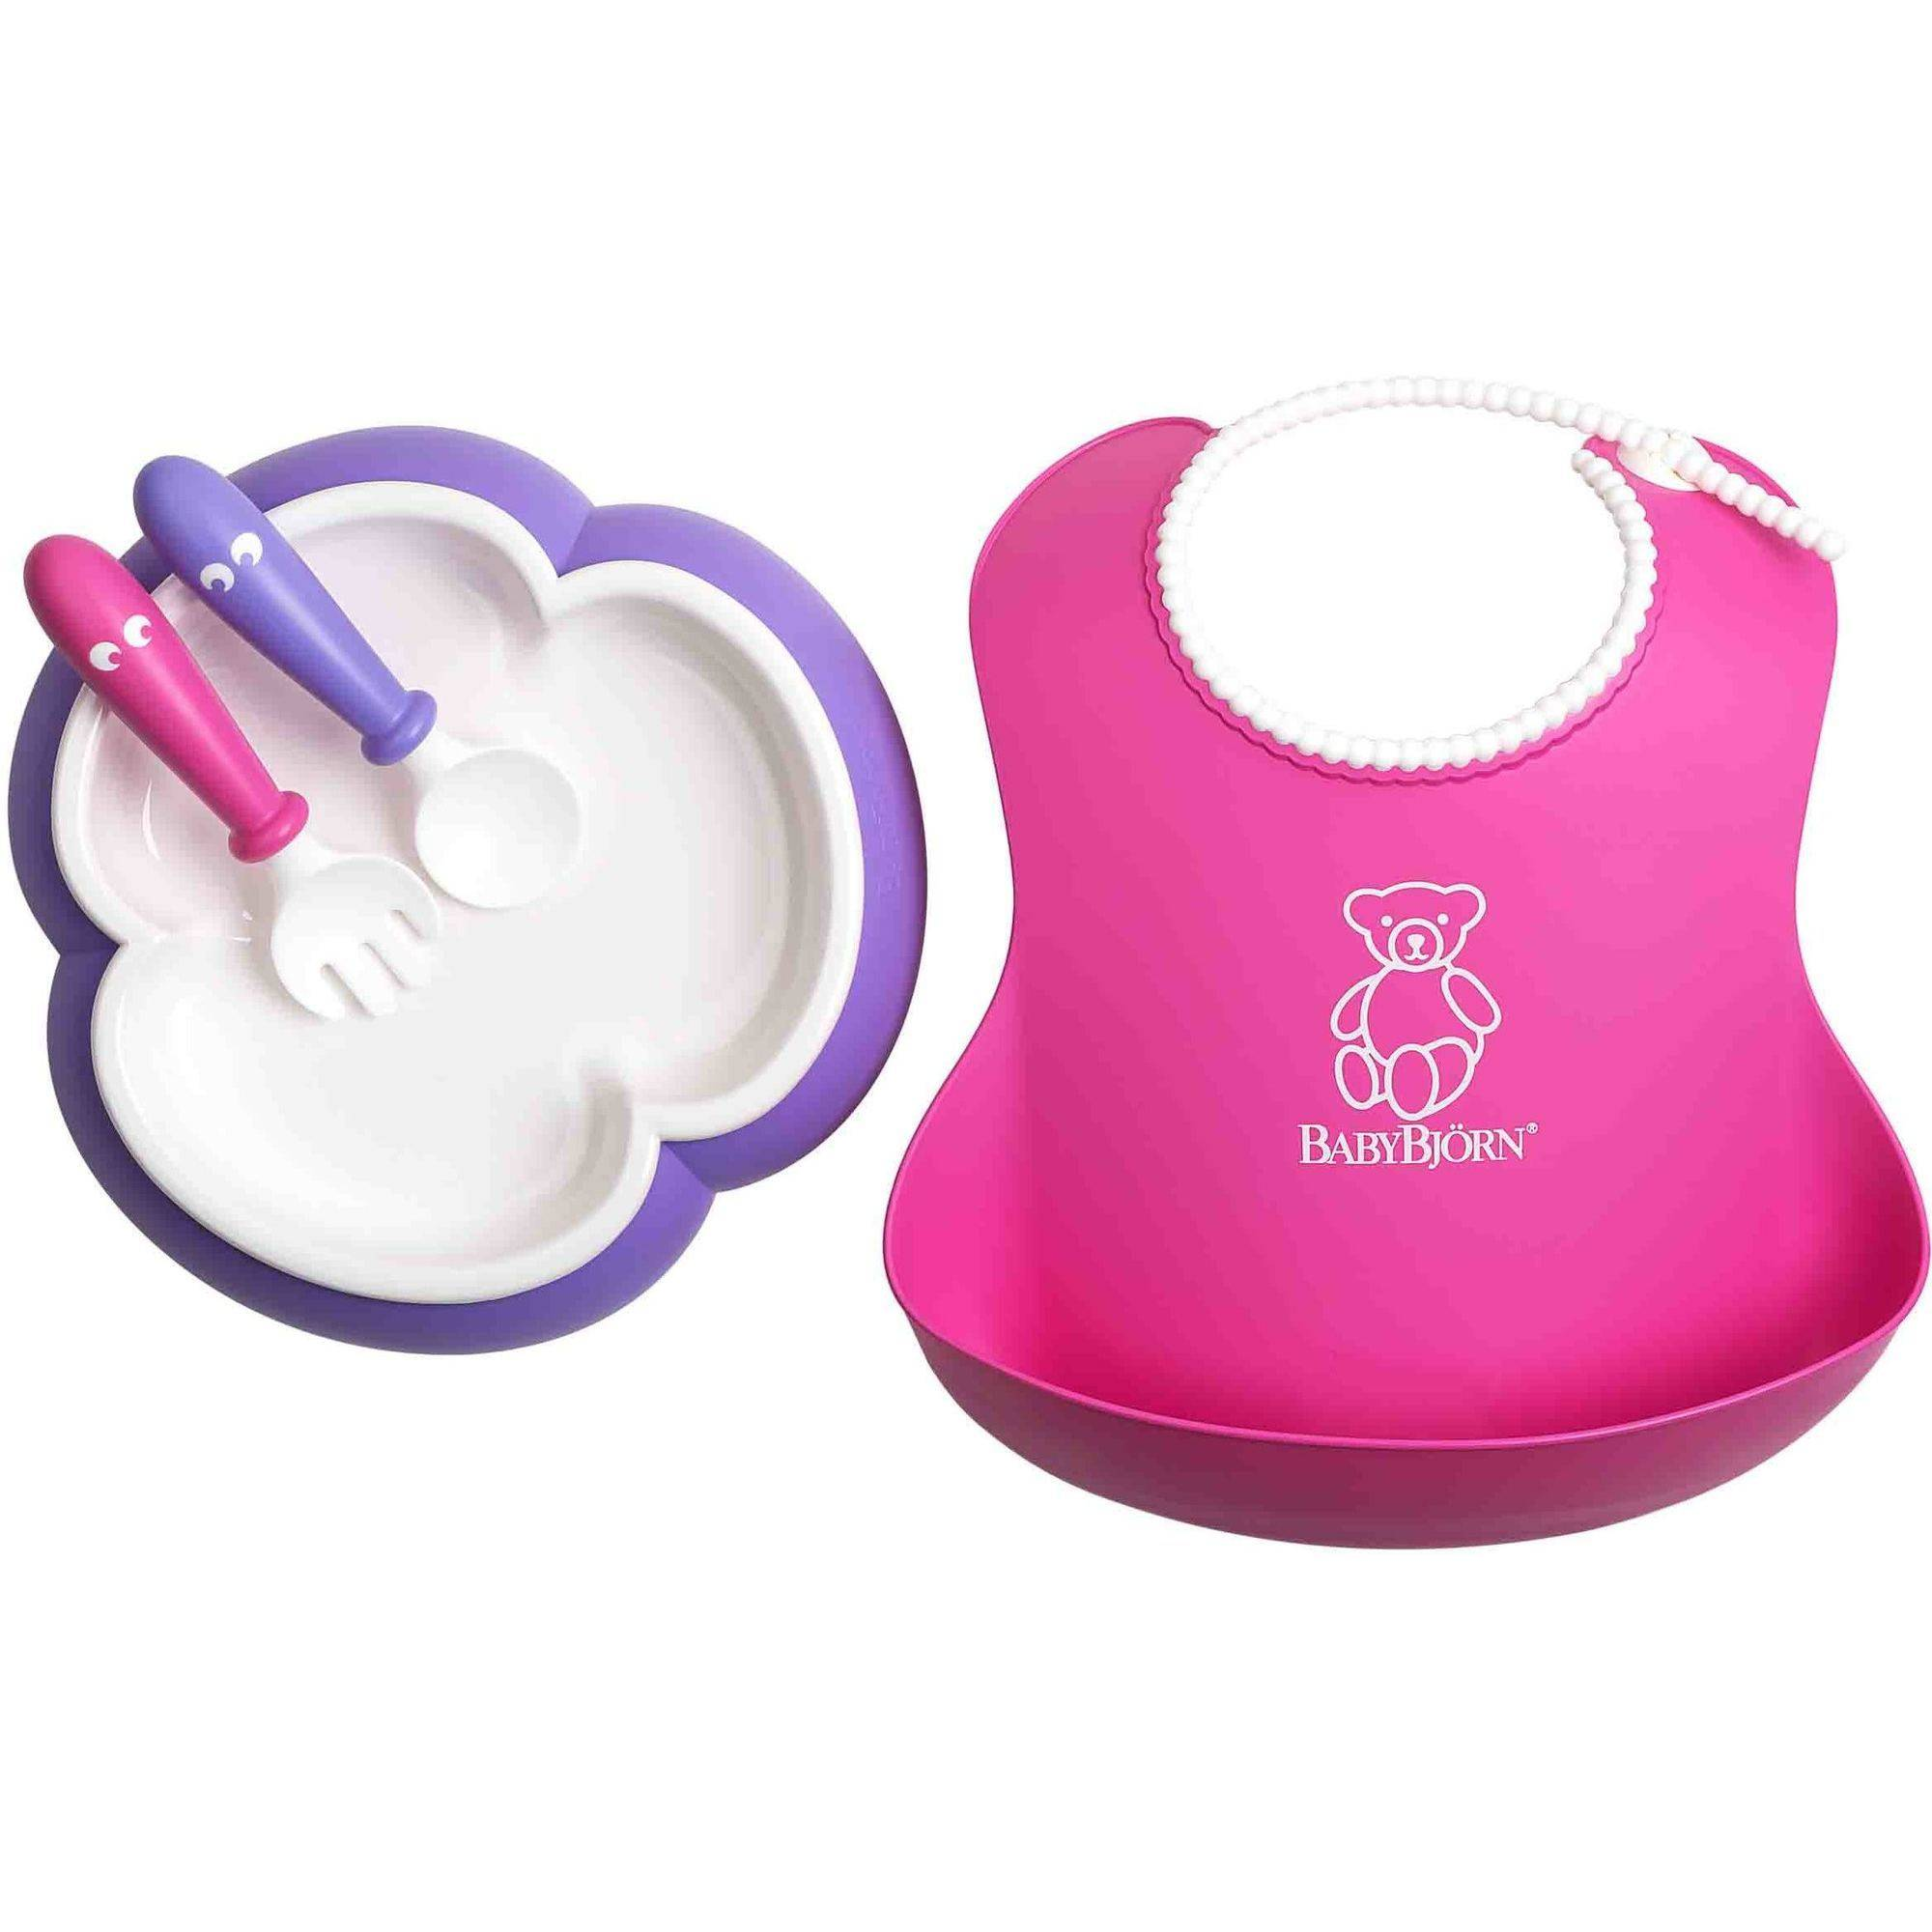 BabyBjorn Baby Feeding Set, Pink Soft Bib, Purple Plate, Purple Spoon and Pink Fork by BabyBj%C3%B6rn